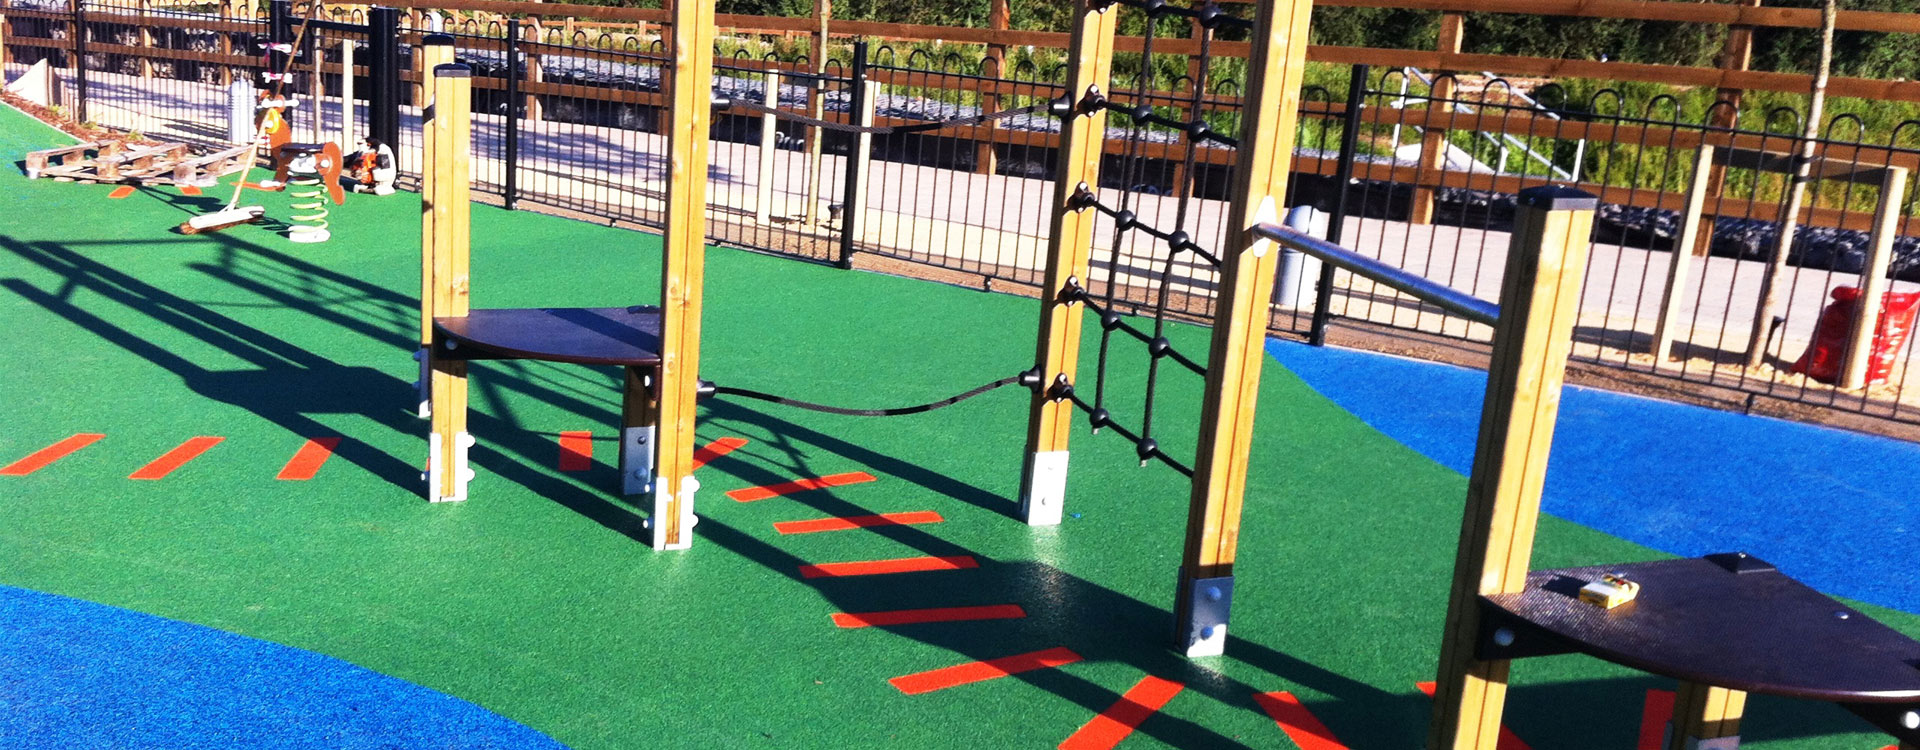 LAP, LEAP, NEAP Play Area - Soft Surfaces Ltd: The UK's